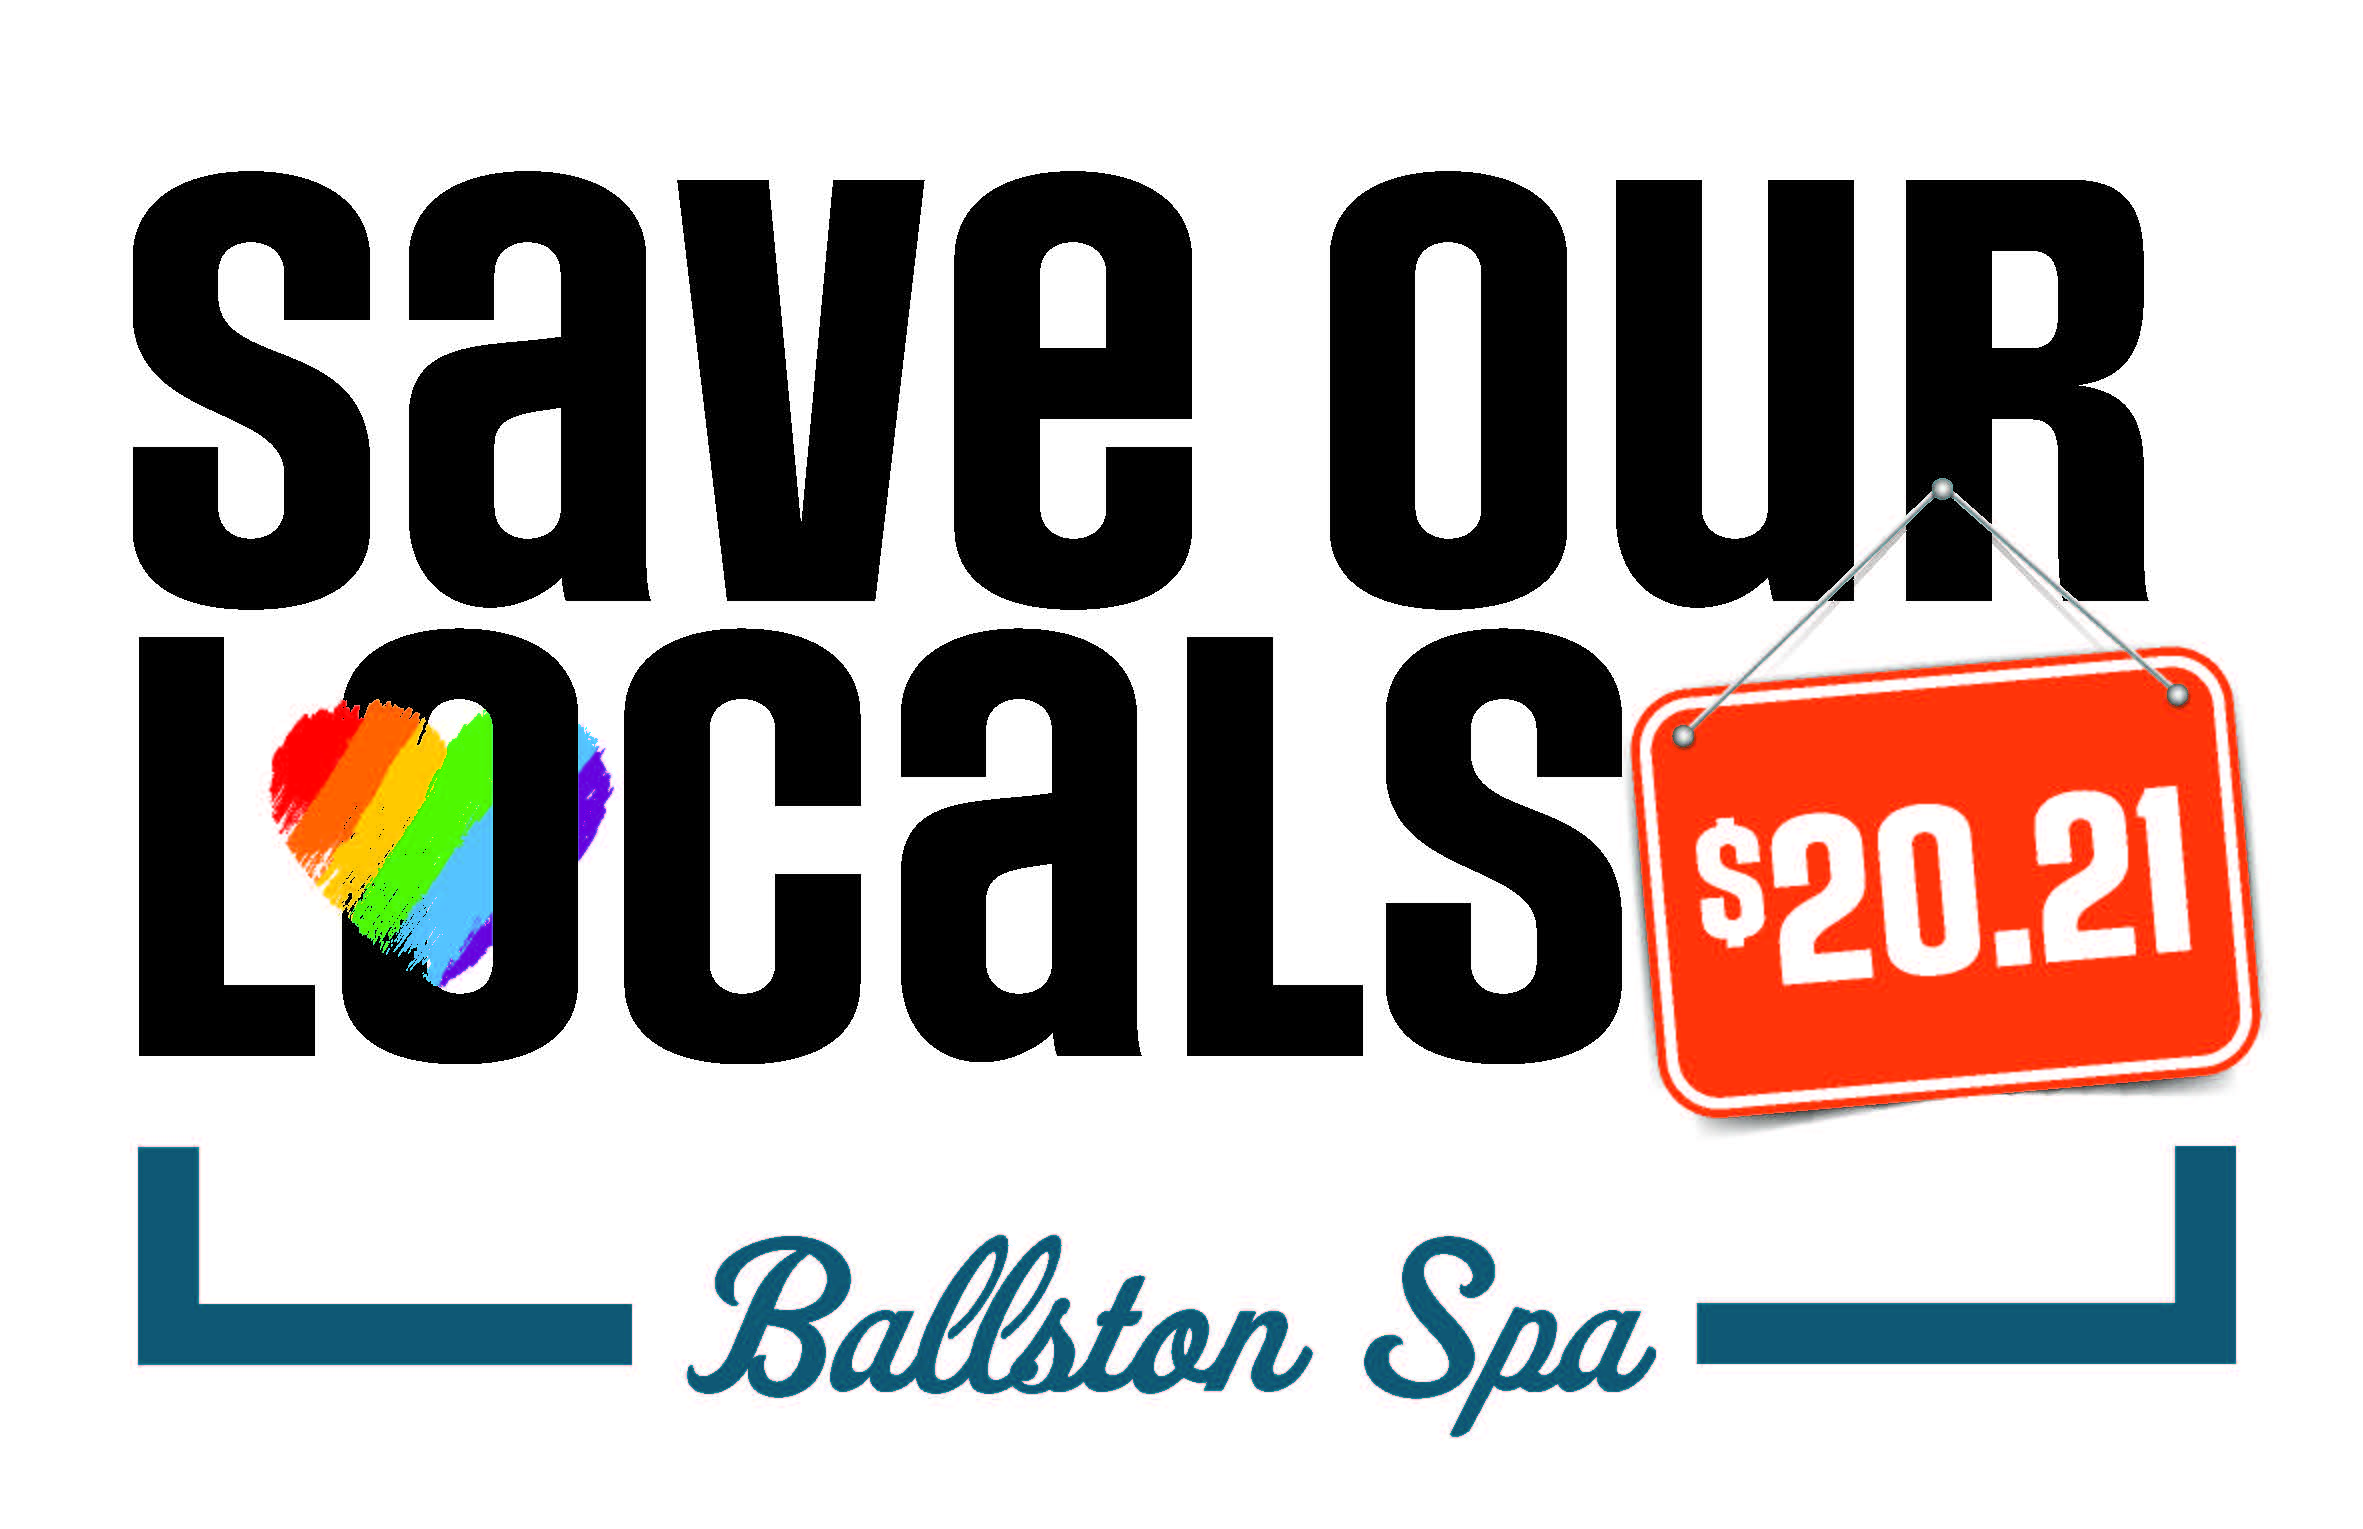 Save Our Locals 2021 Ballston Spa